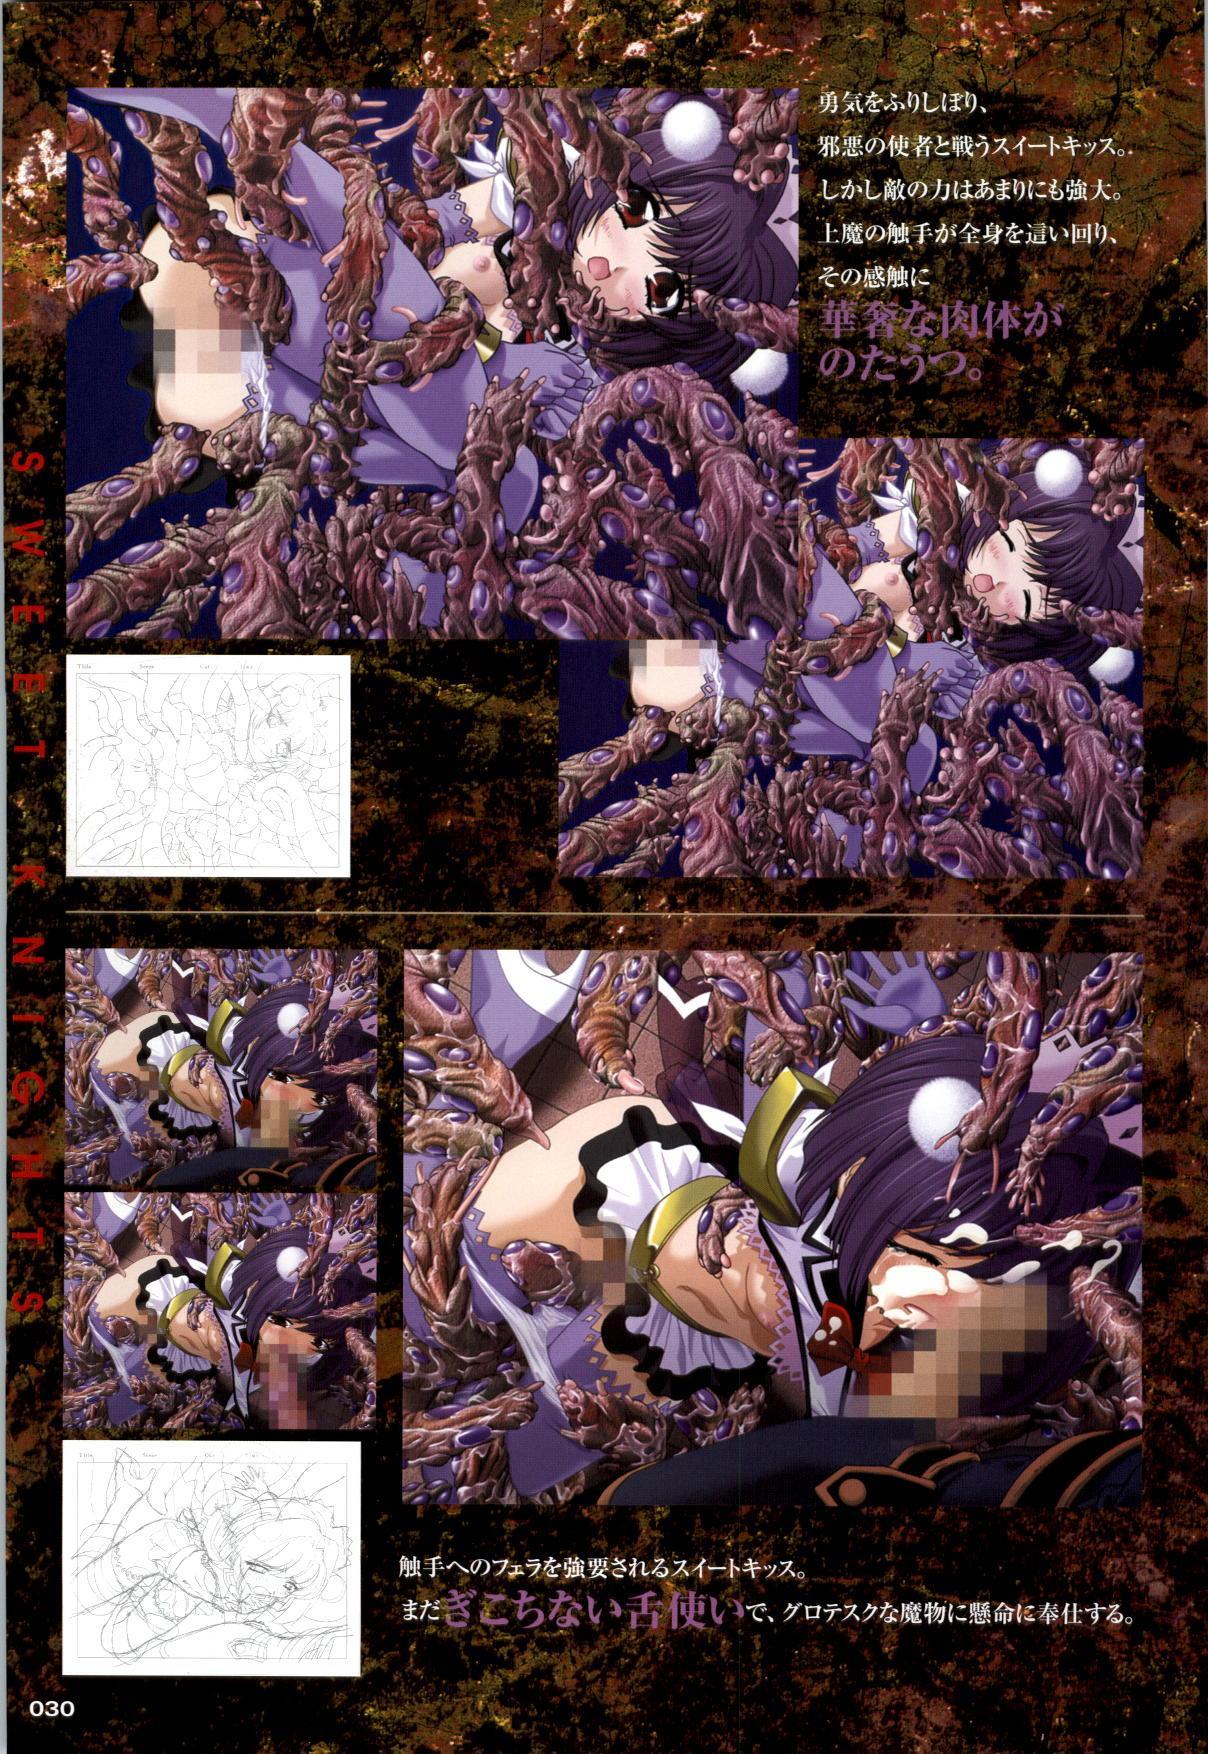 Mahou Senshi Sweet Knight & Mahou Senshi Princess Tear 29